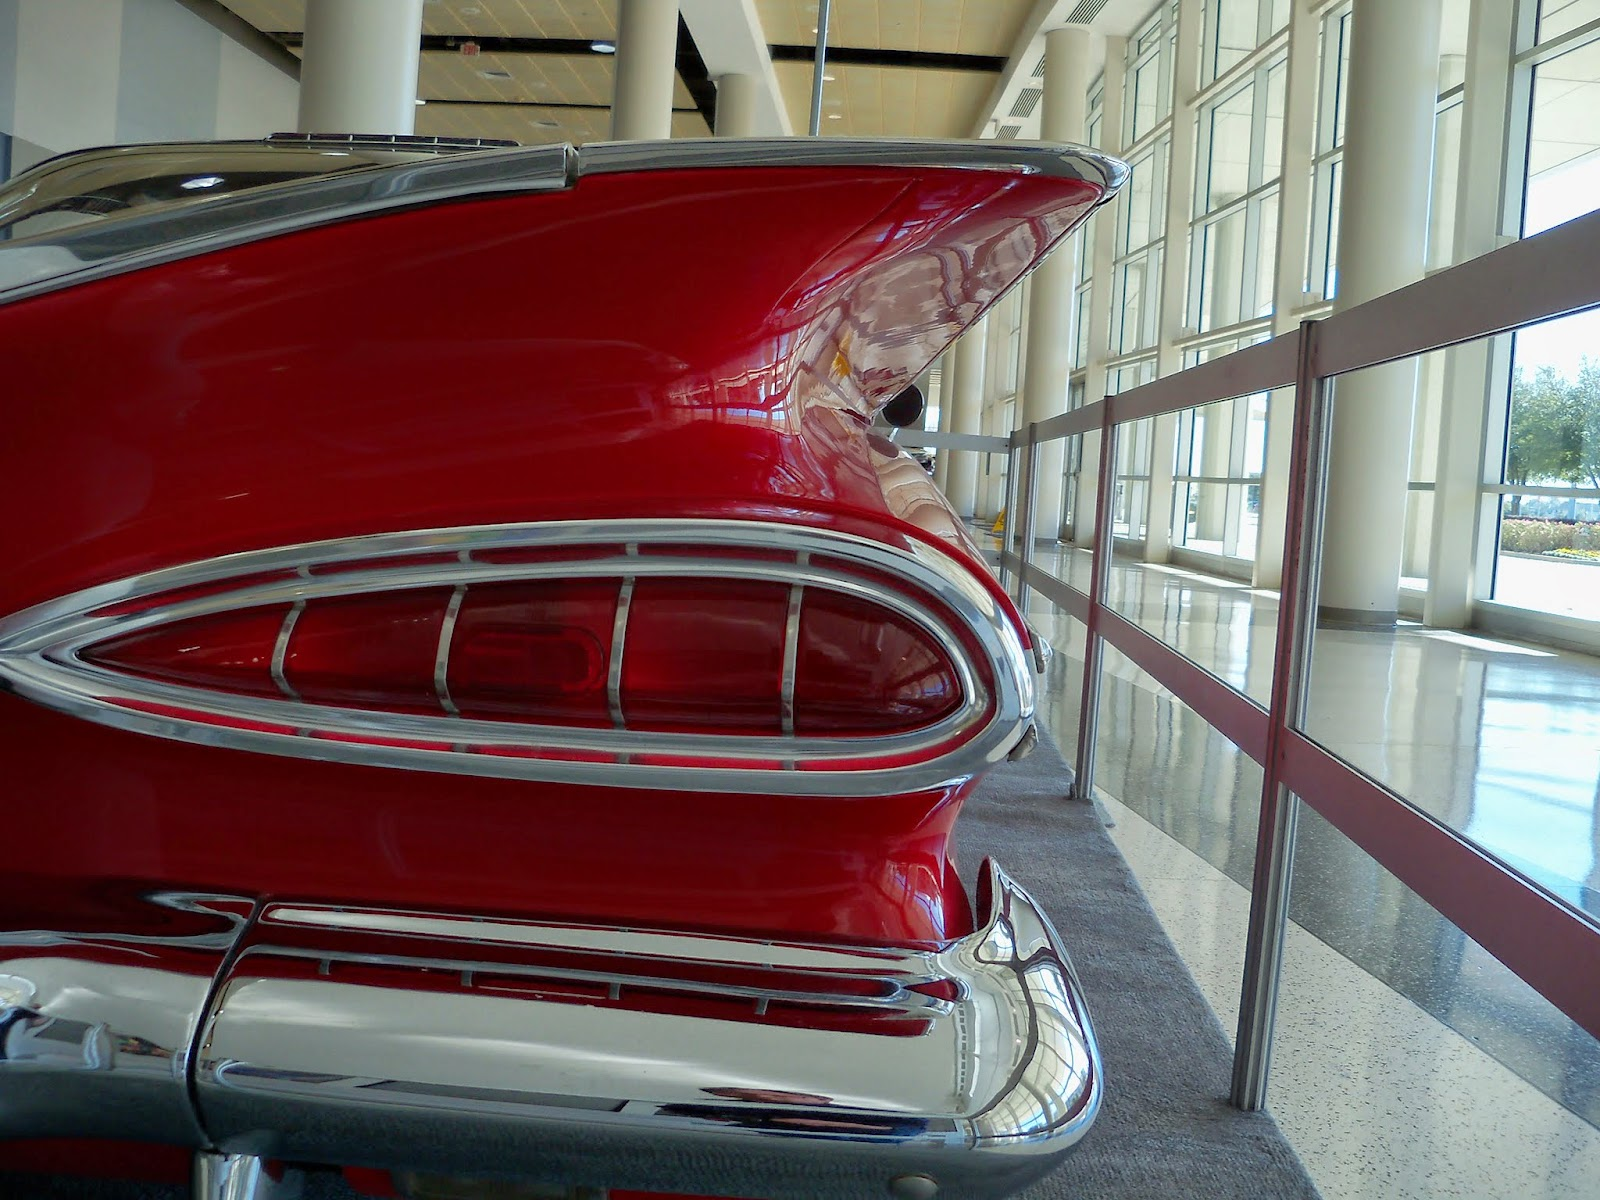 Houston Auto Show 2015 - 116_7202.JPG